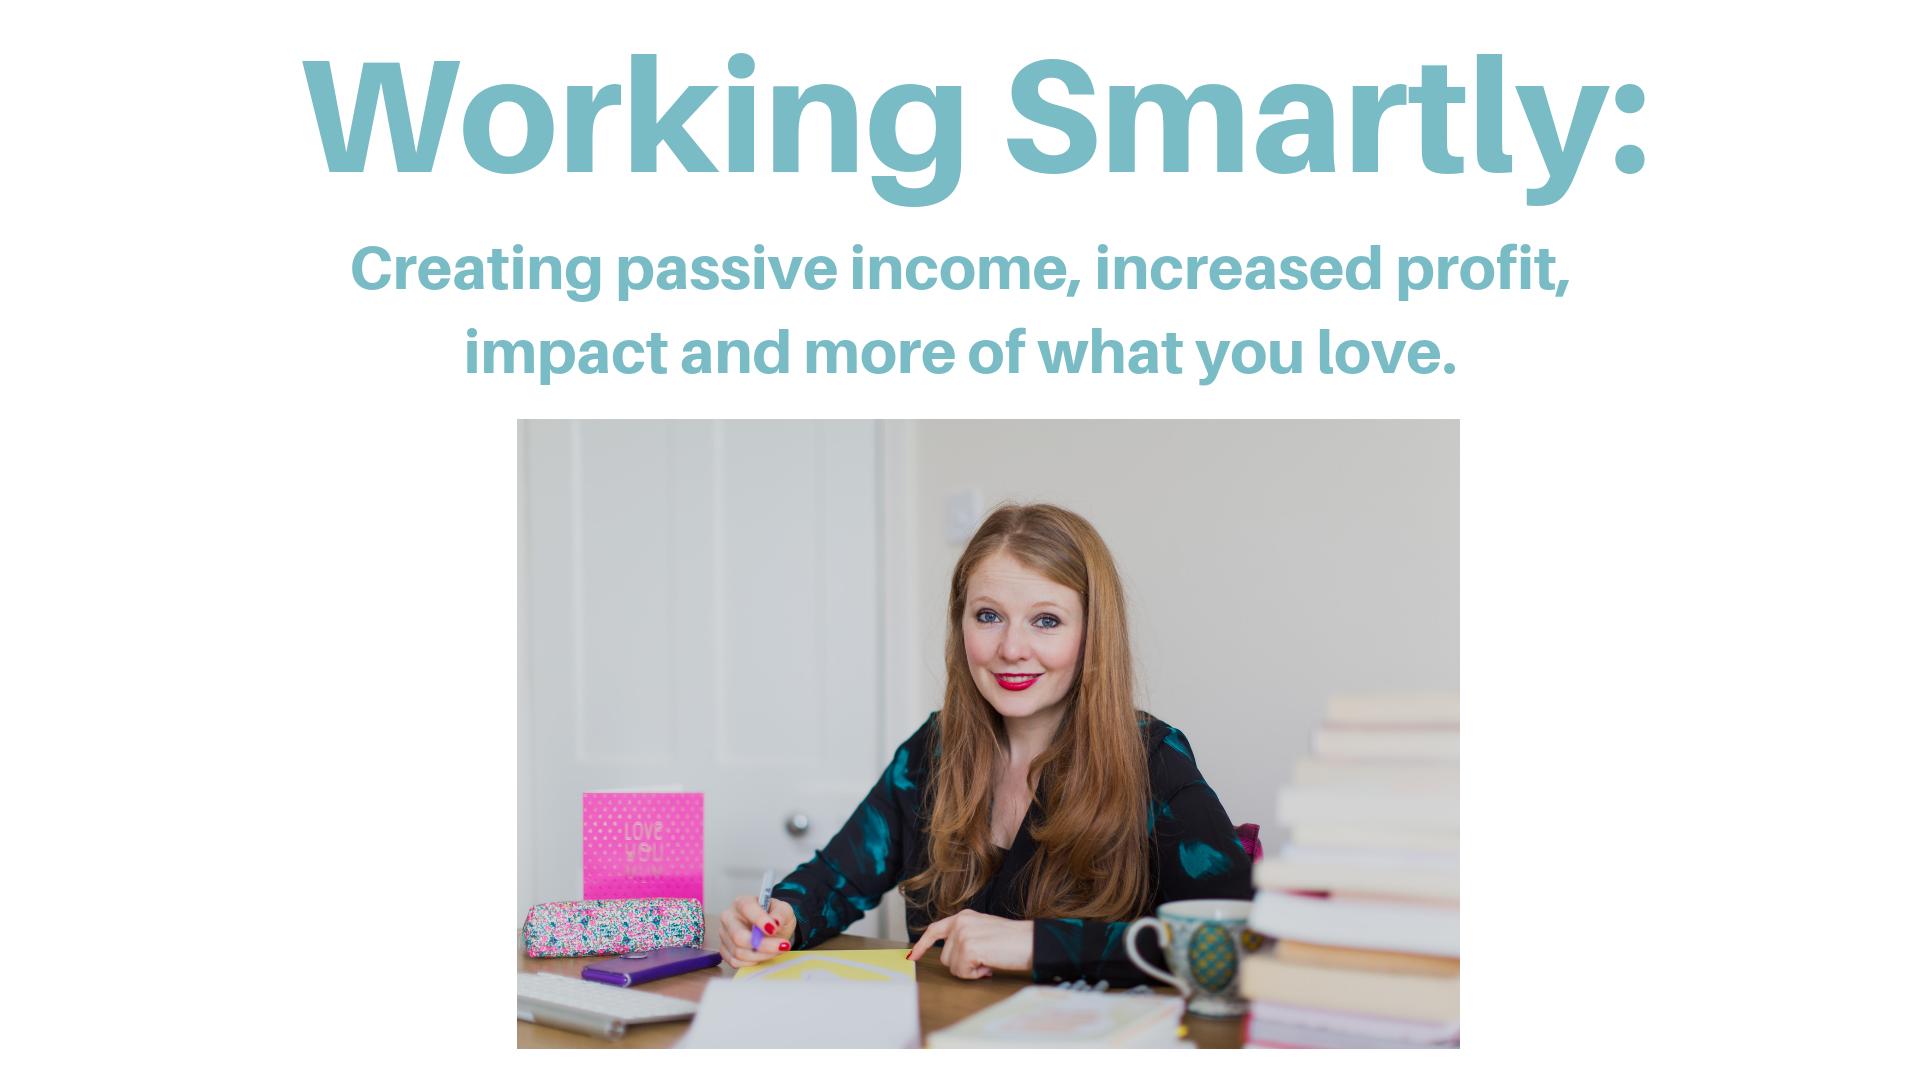 Working Smartly